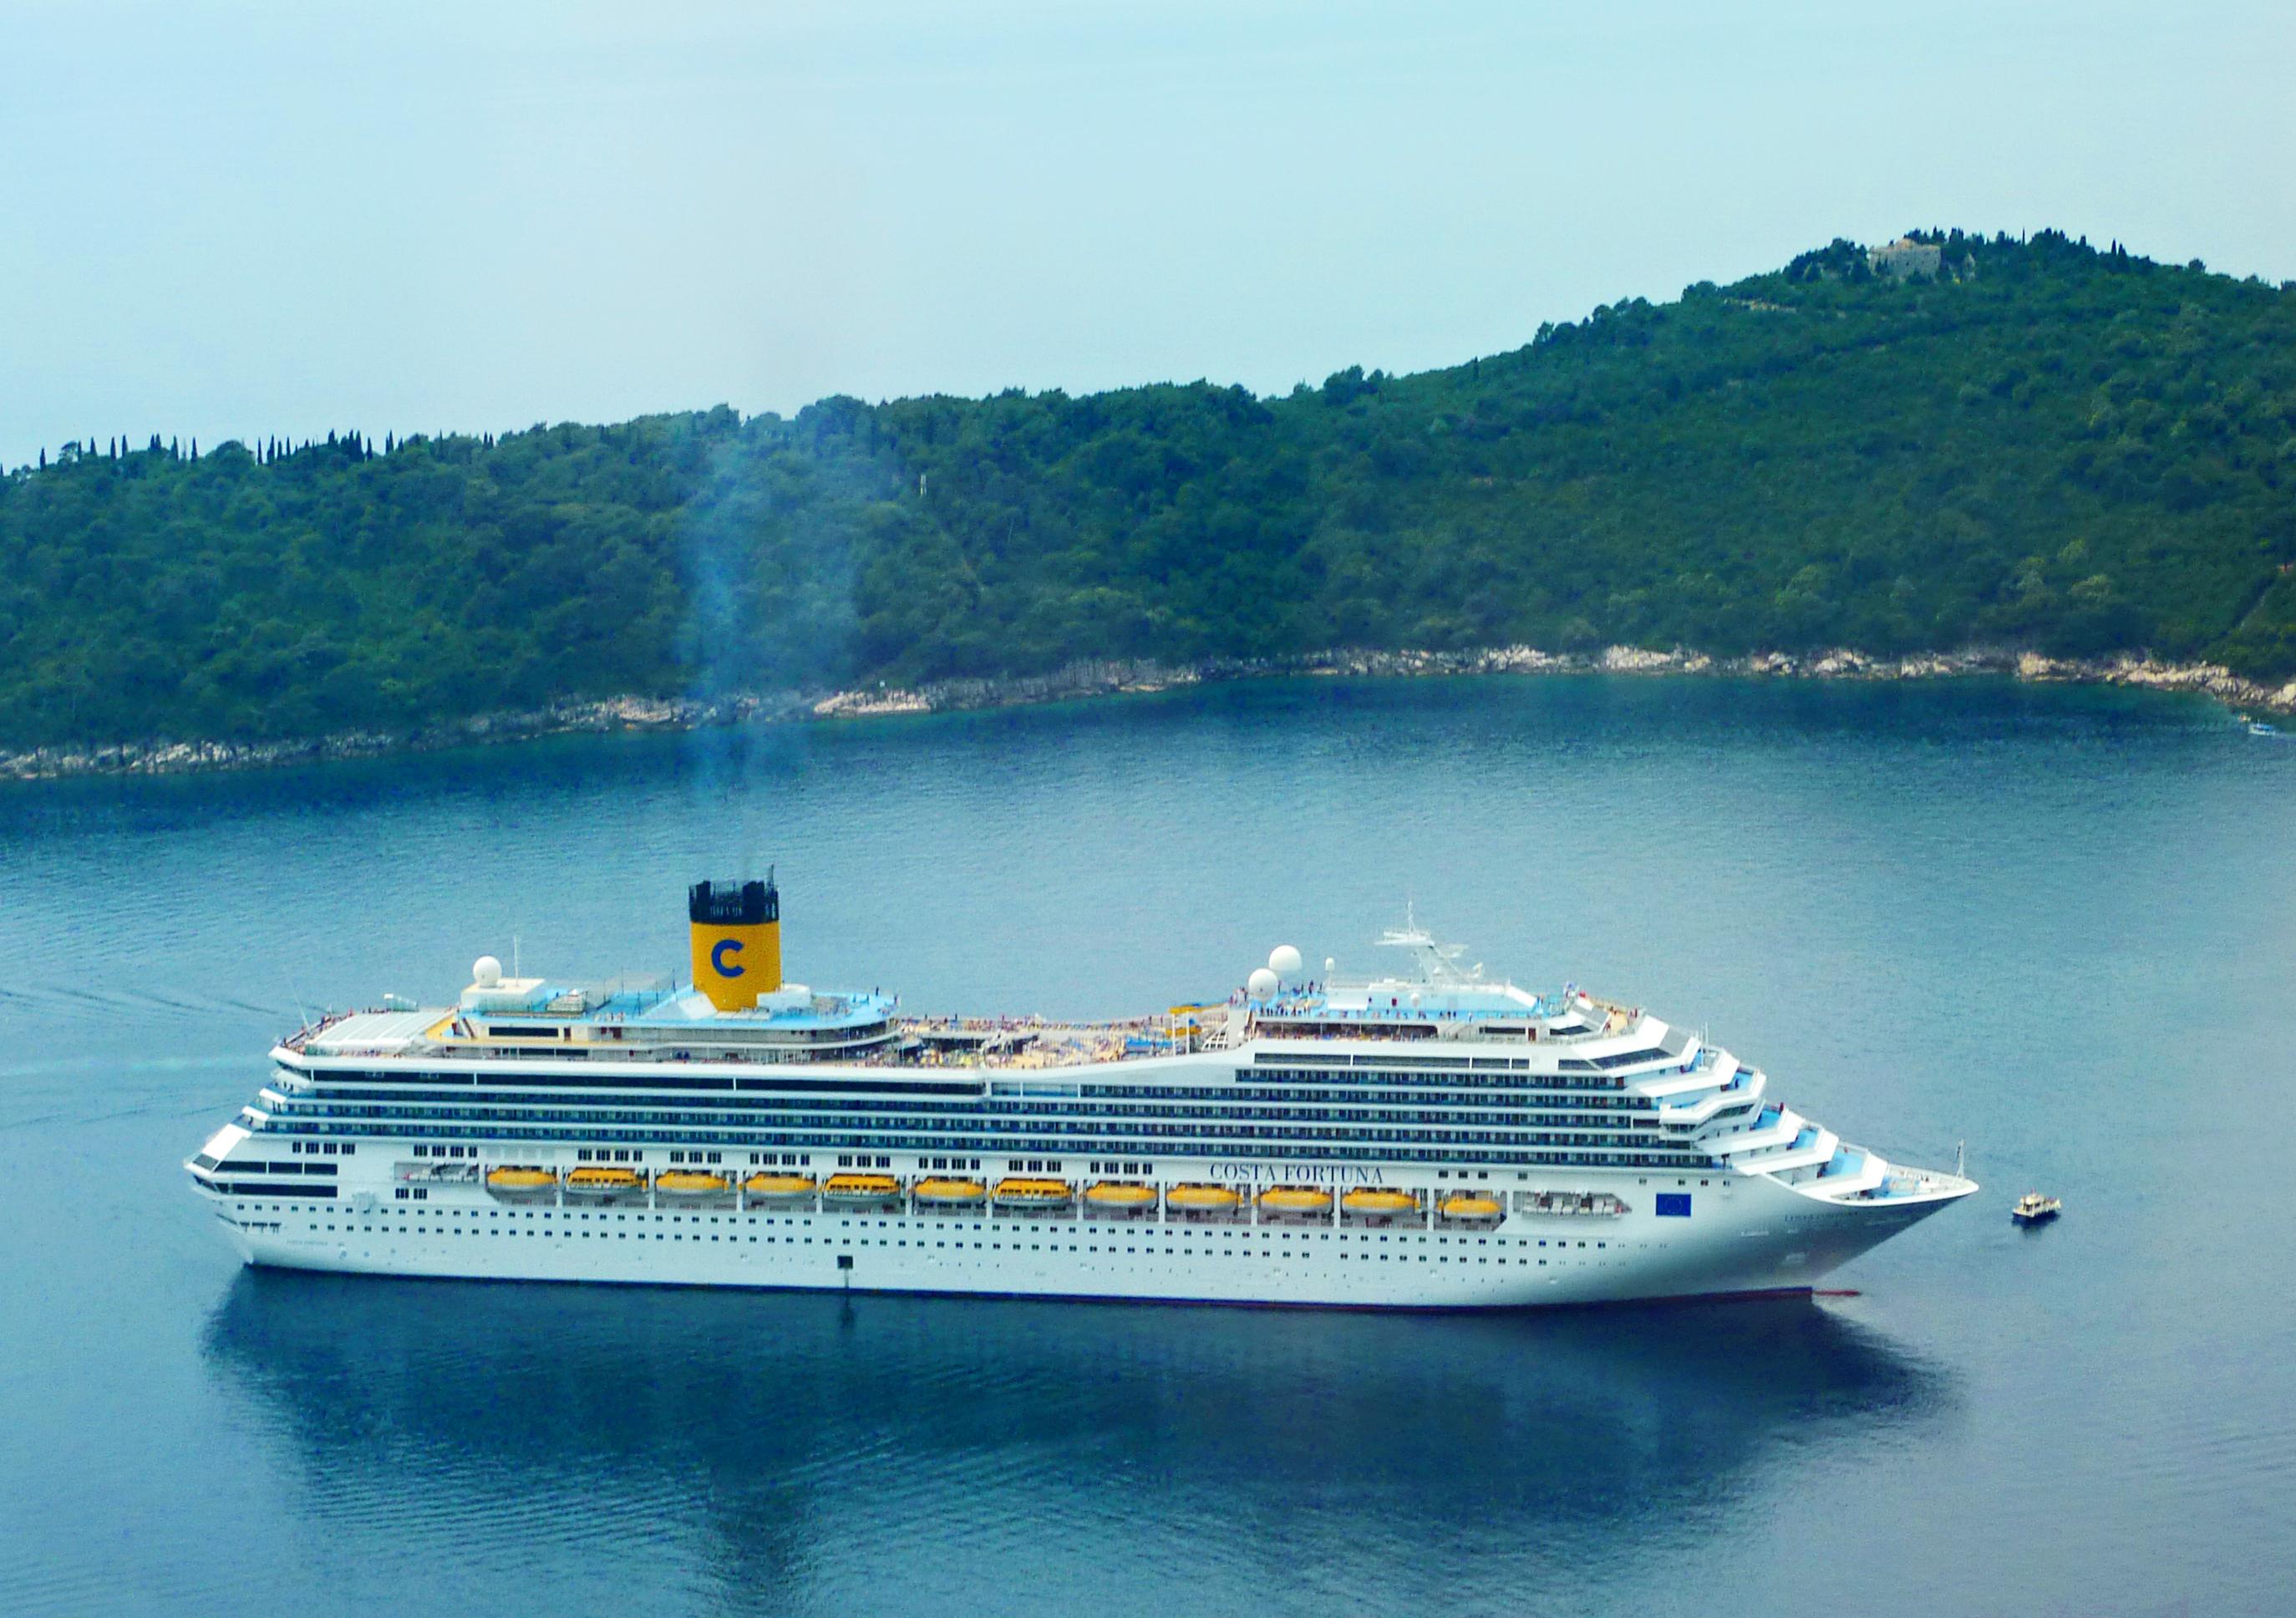 FileCosta Fortuna Cruise Shipjpg  Wikimedia Commons